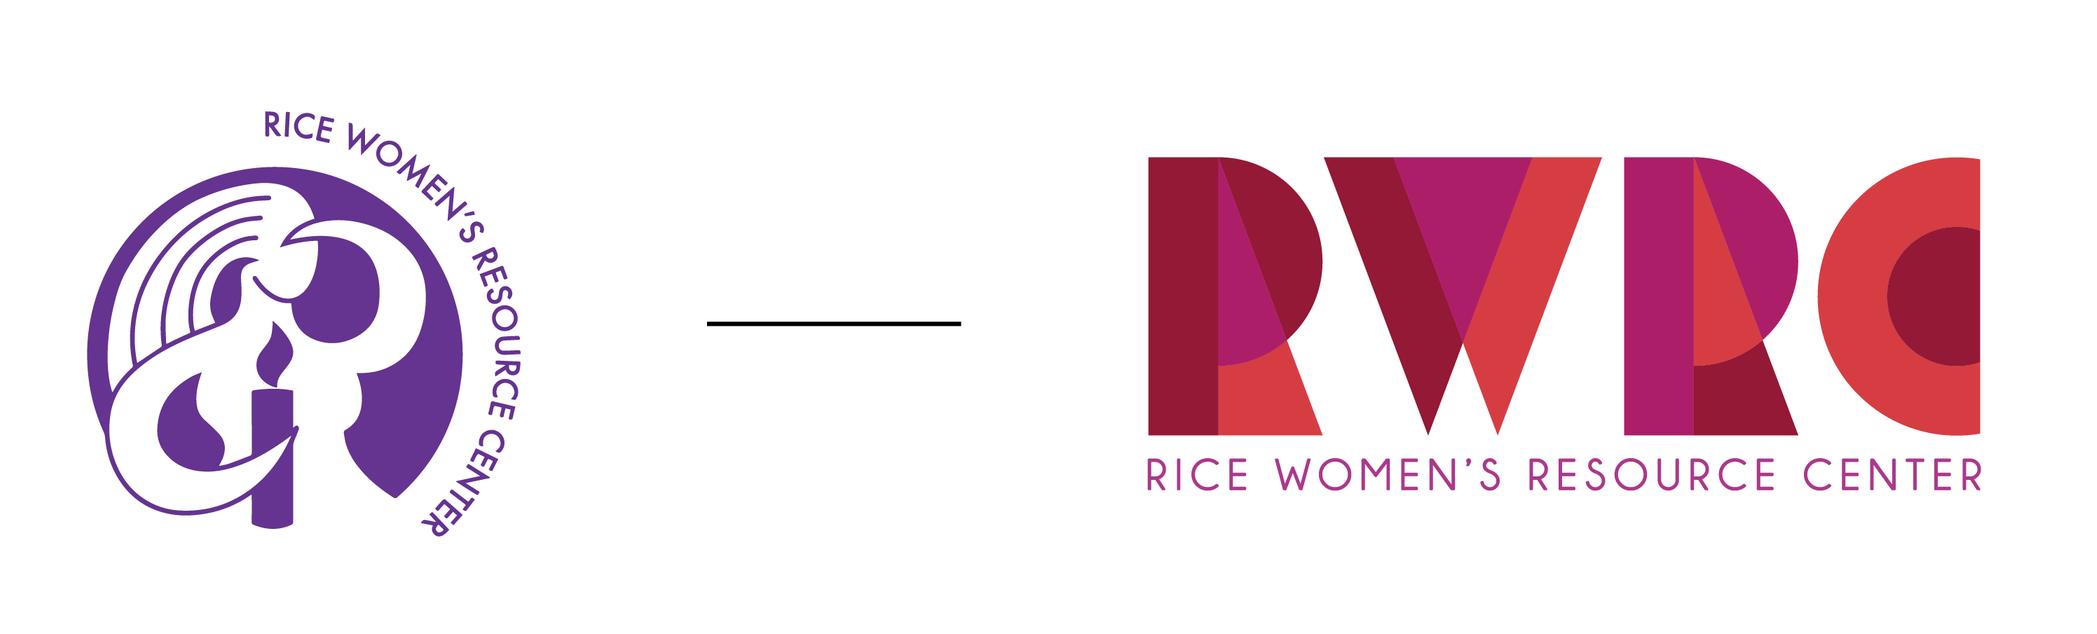 RWRC-01-01.png